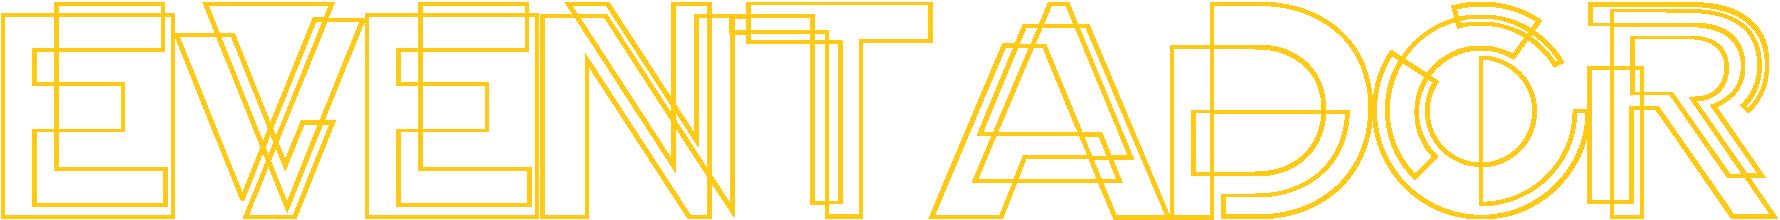 hero-title-image